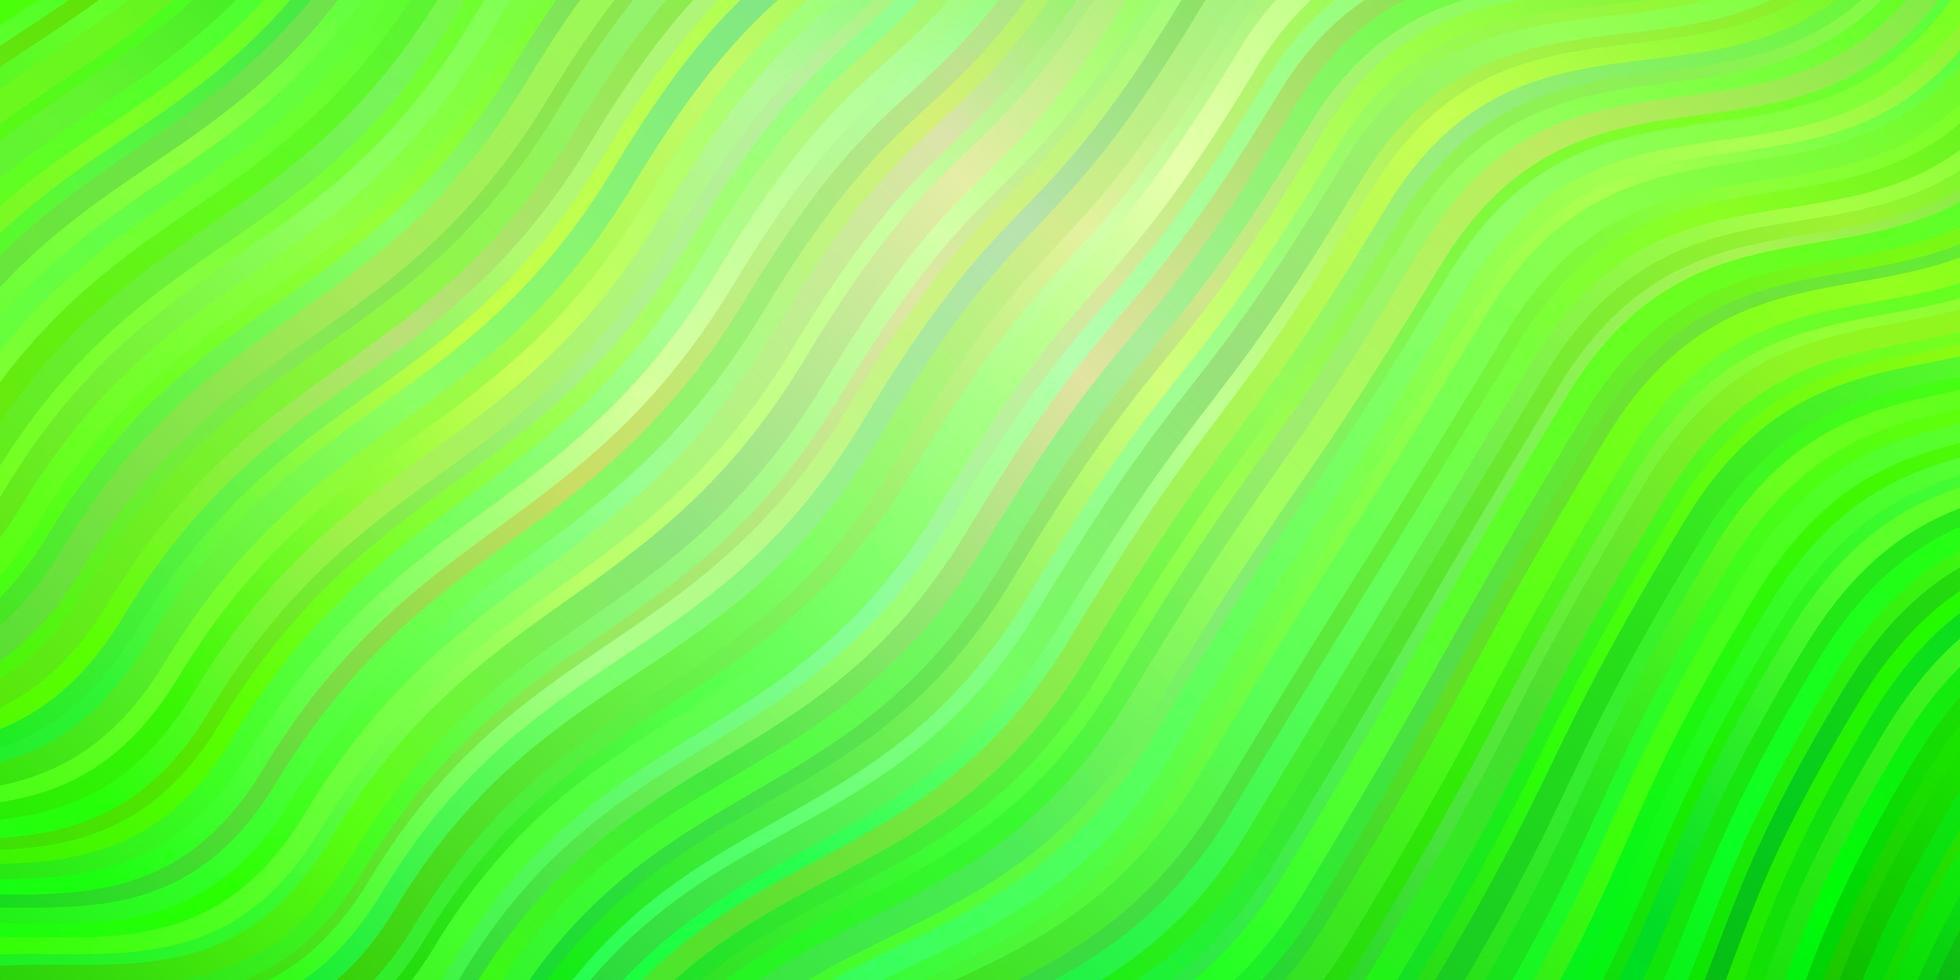 hellgrünes Vektormuster mit schiefen Linien. vektor